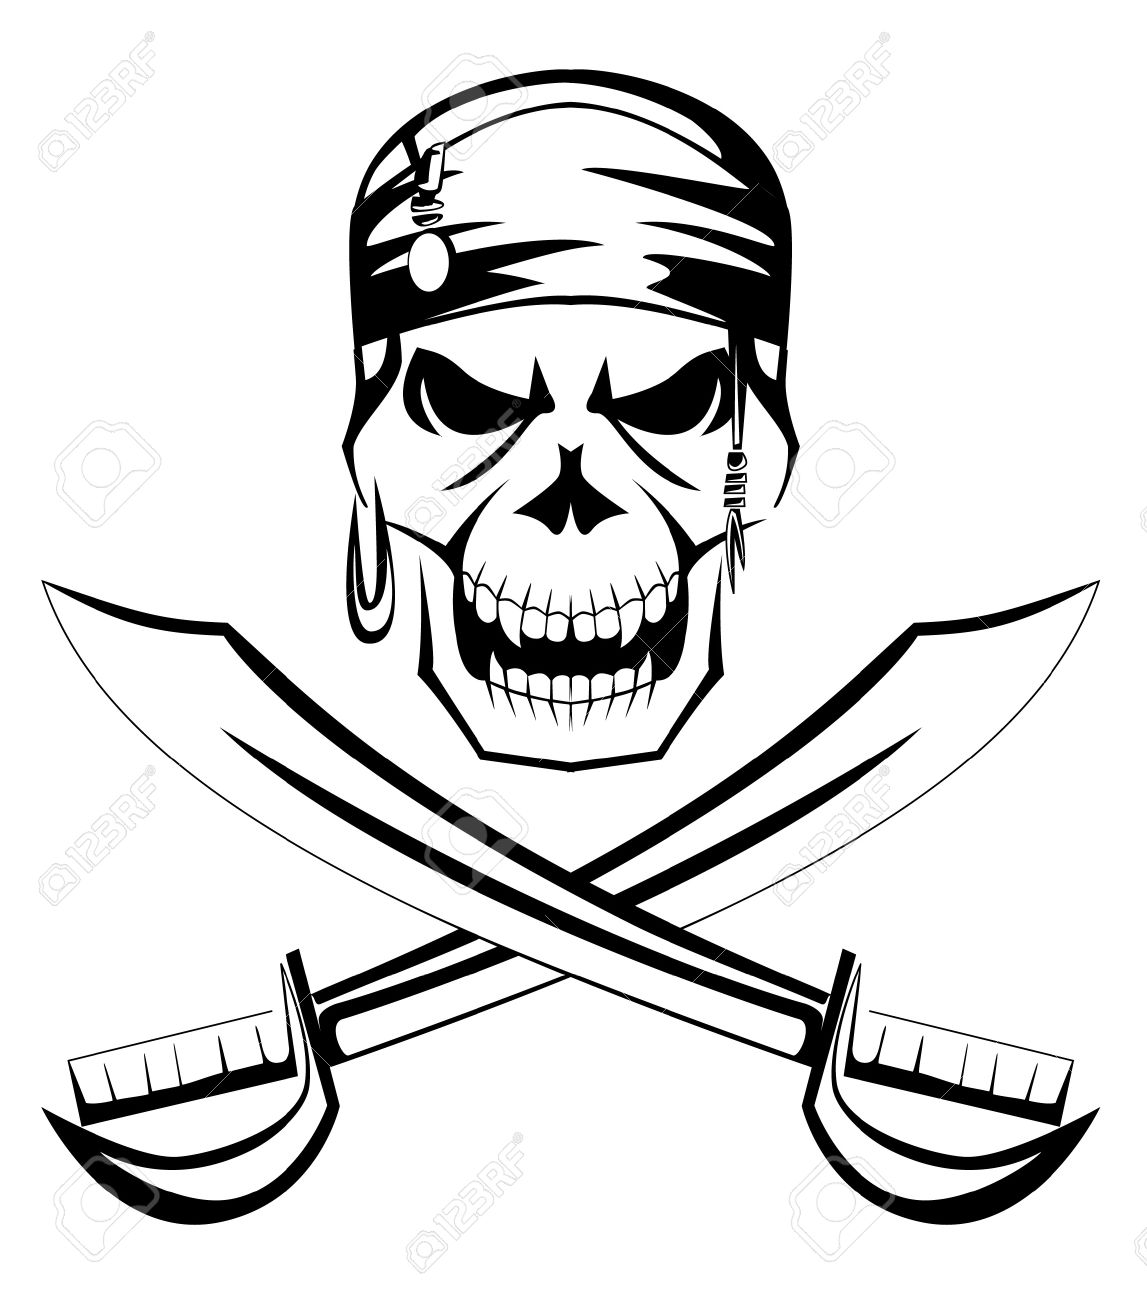 Pirate Clipart Black And White